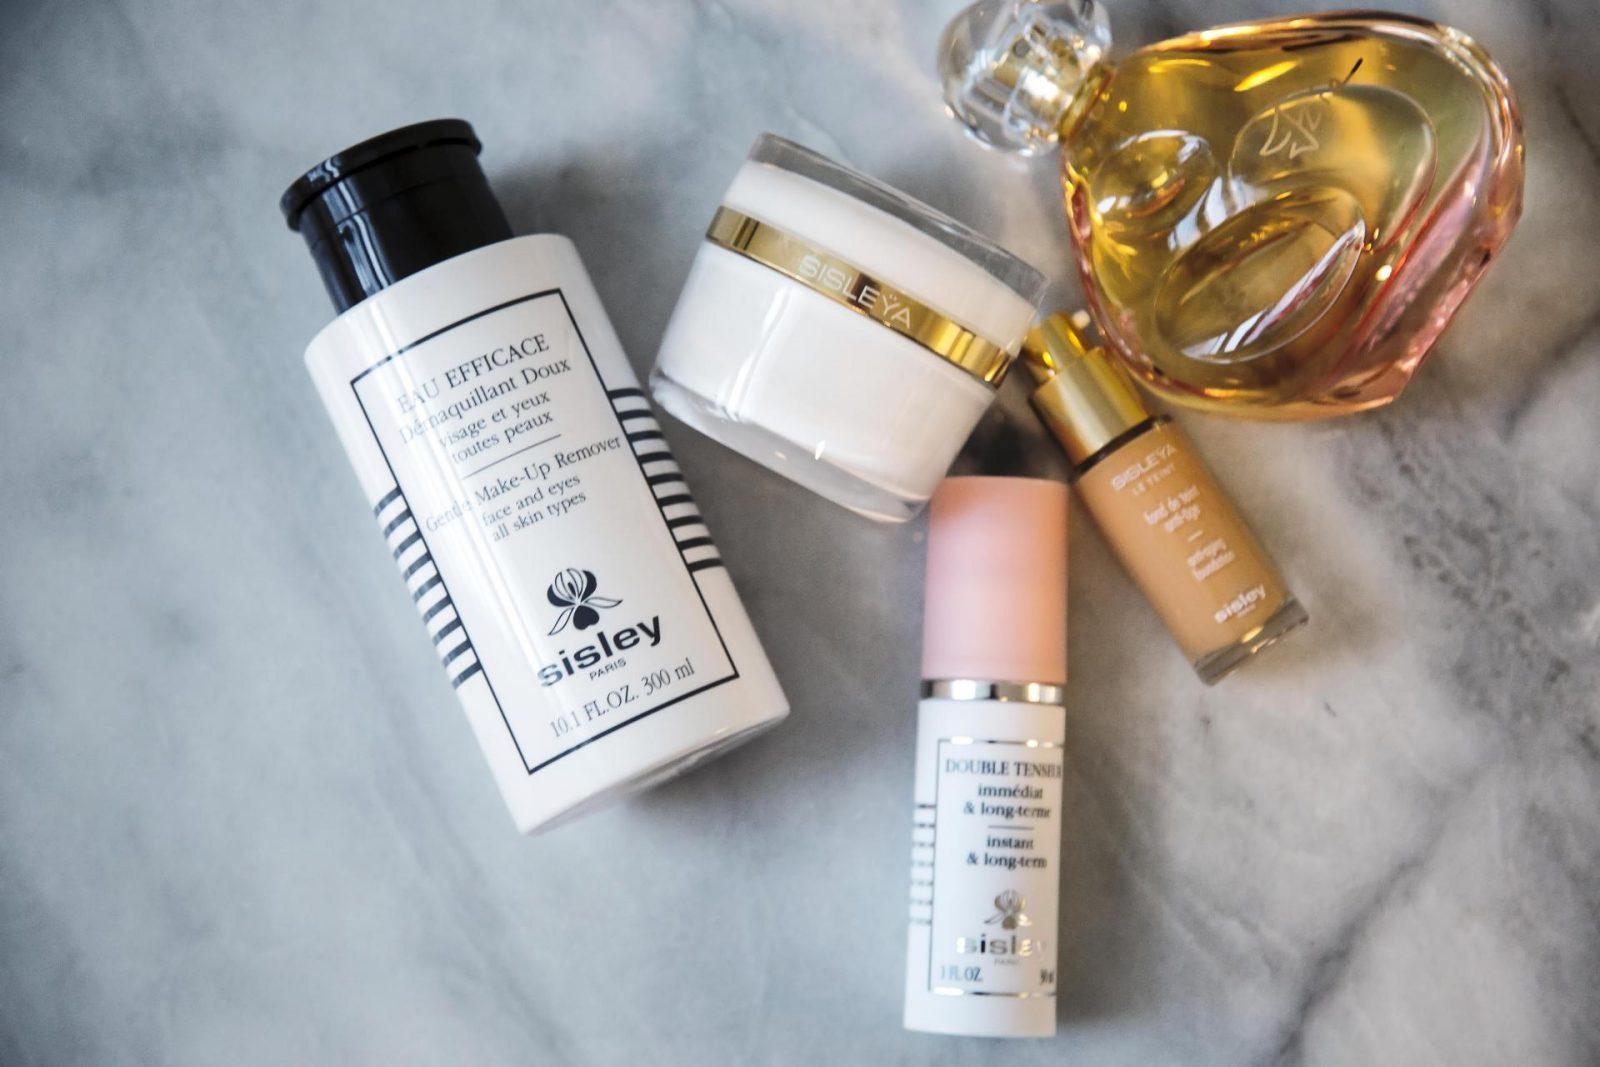 Sisley Paris Beauty Skincare